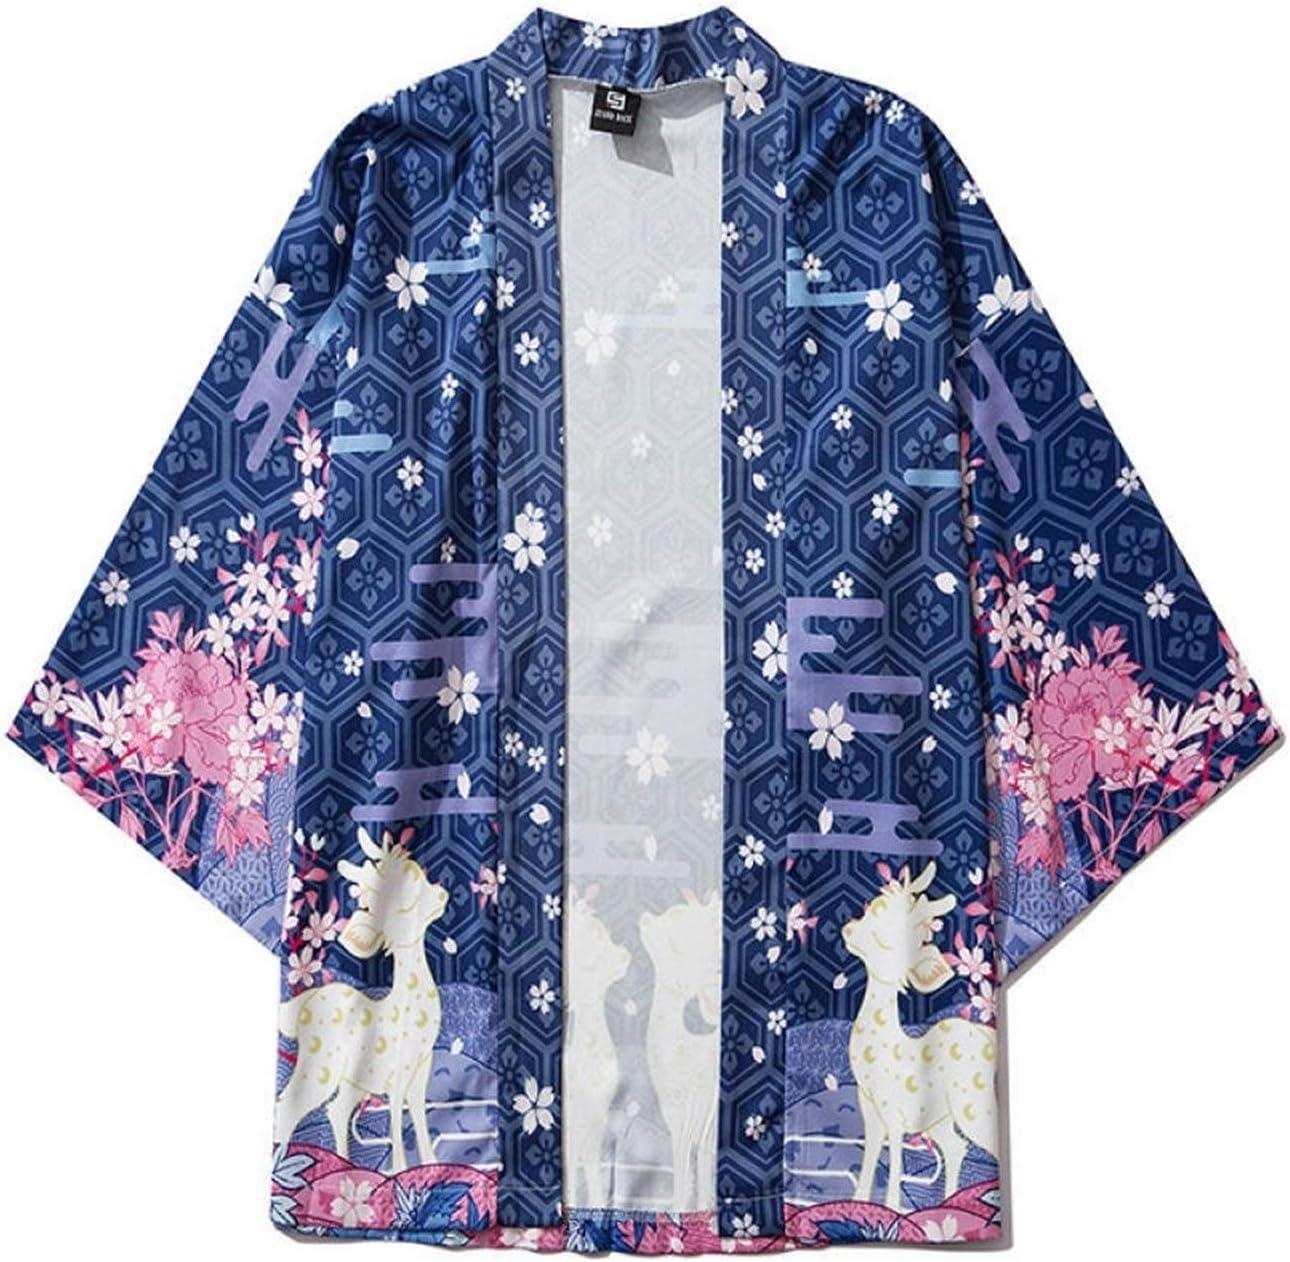 SHUYANshiyu Japanese Ukiyo-e Sika Deer Print Robe China Harajuku Ancient Style (Color : Color, Size : XL)